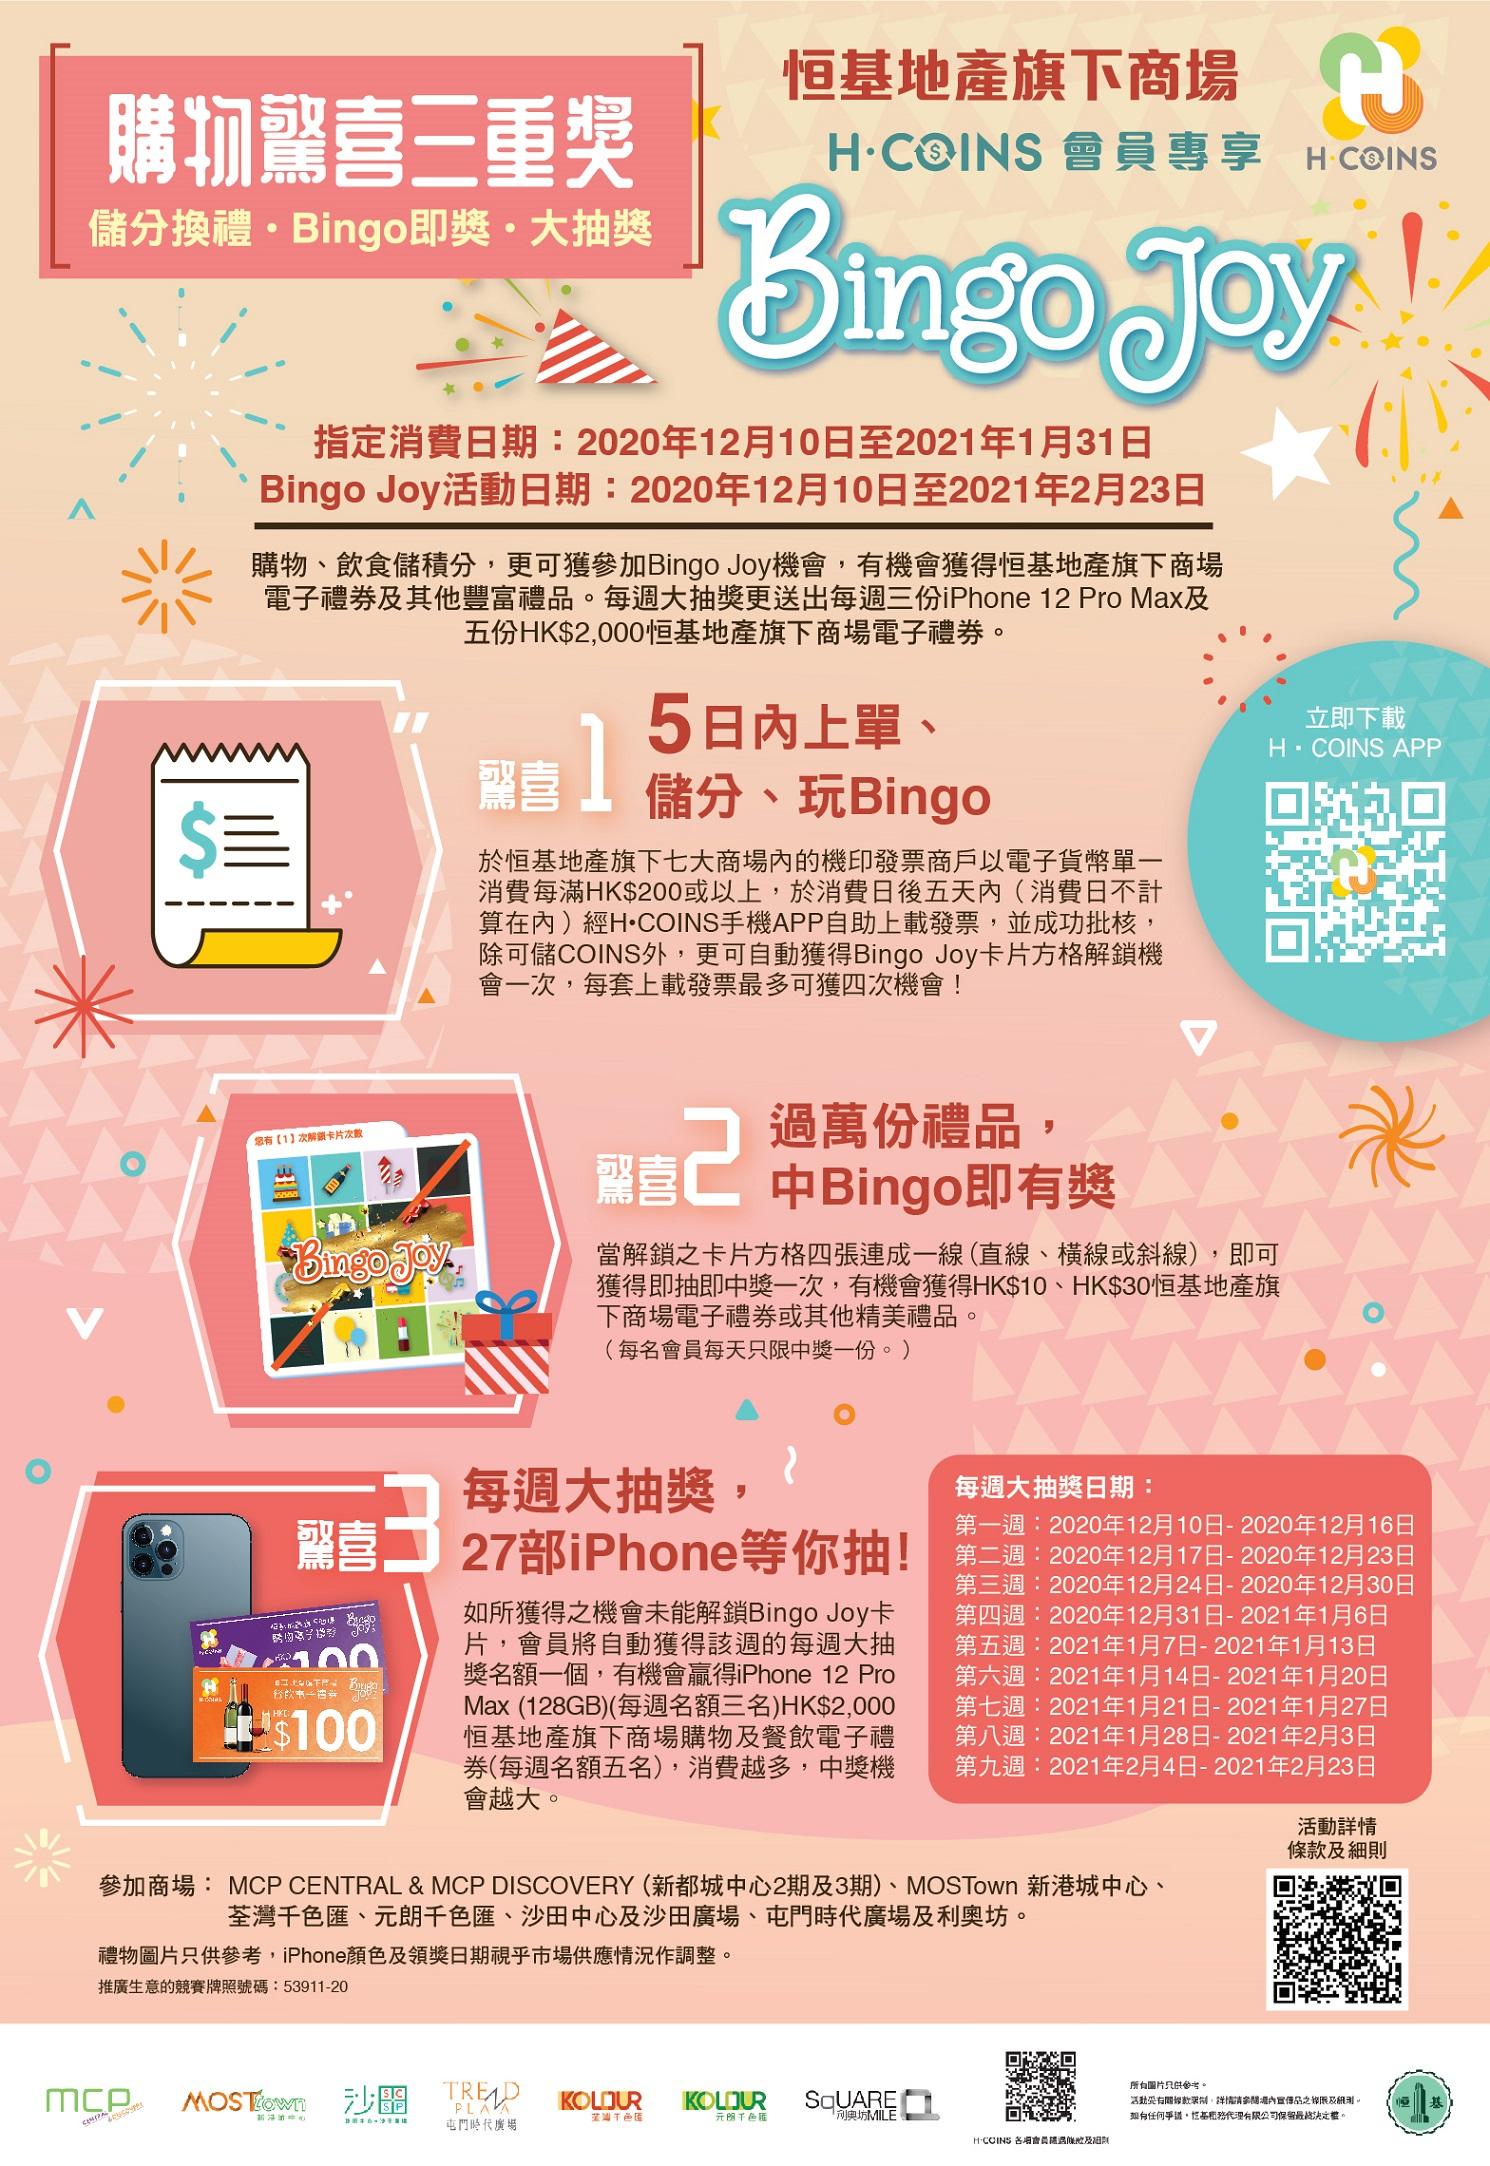 Bingo Joy 購物驚喜三重獎